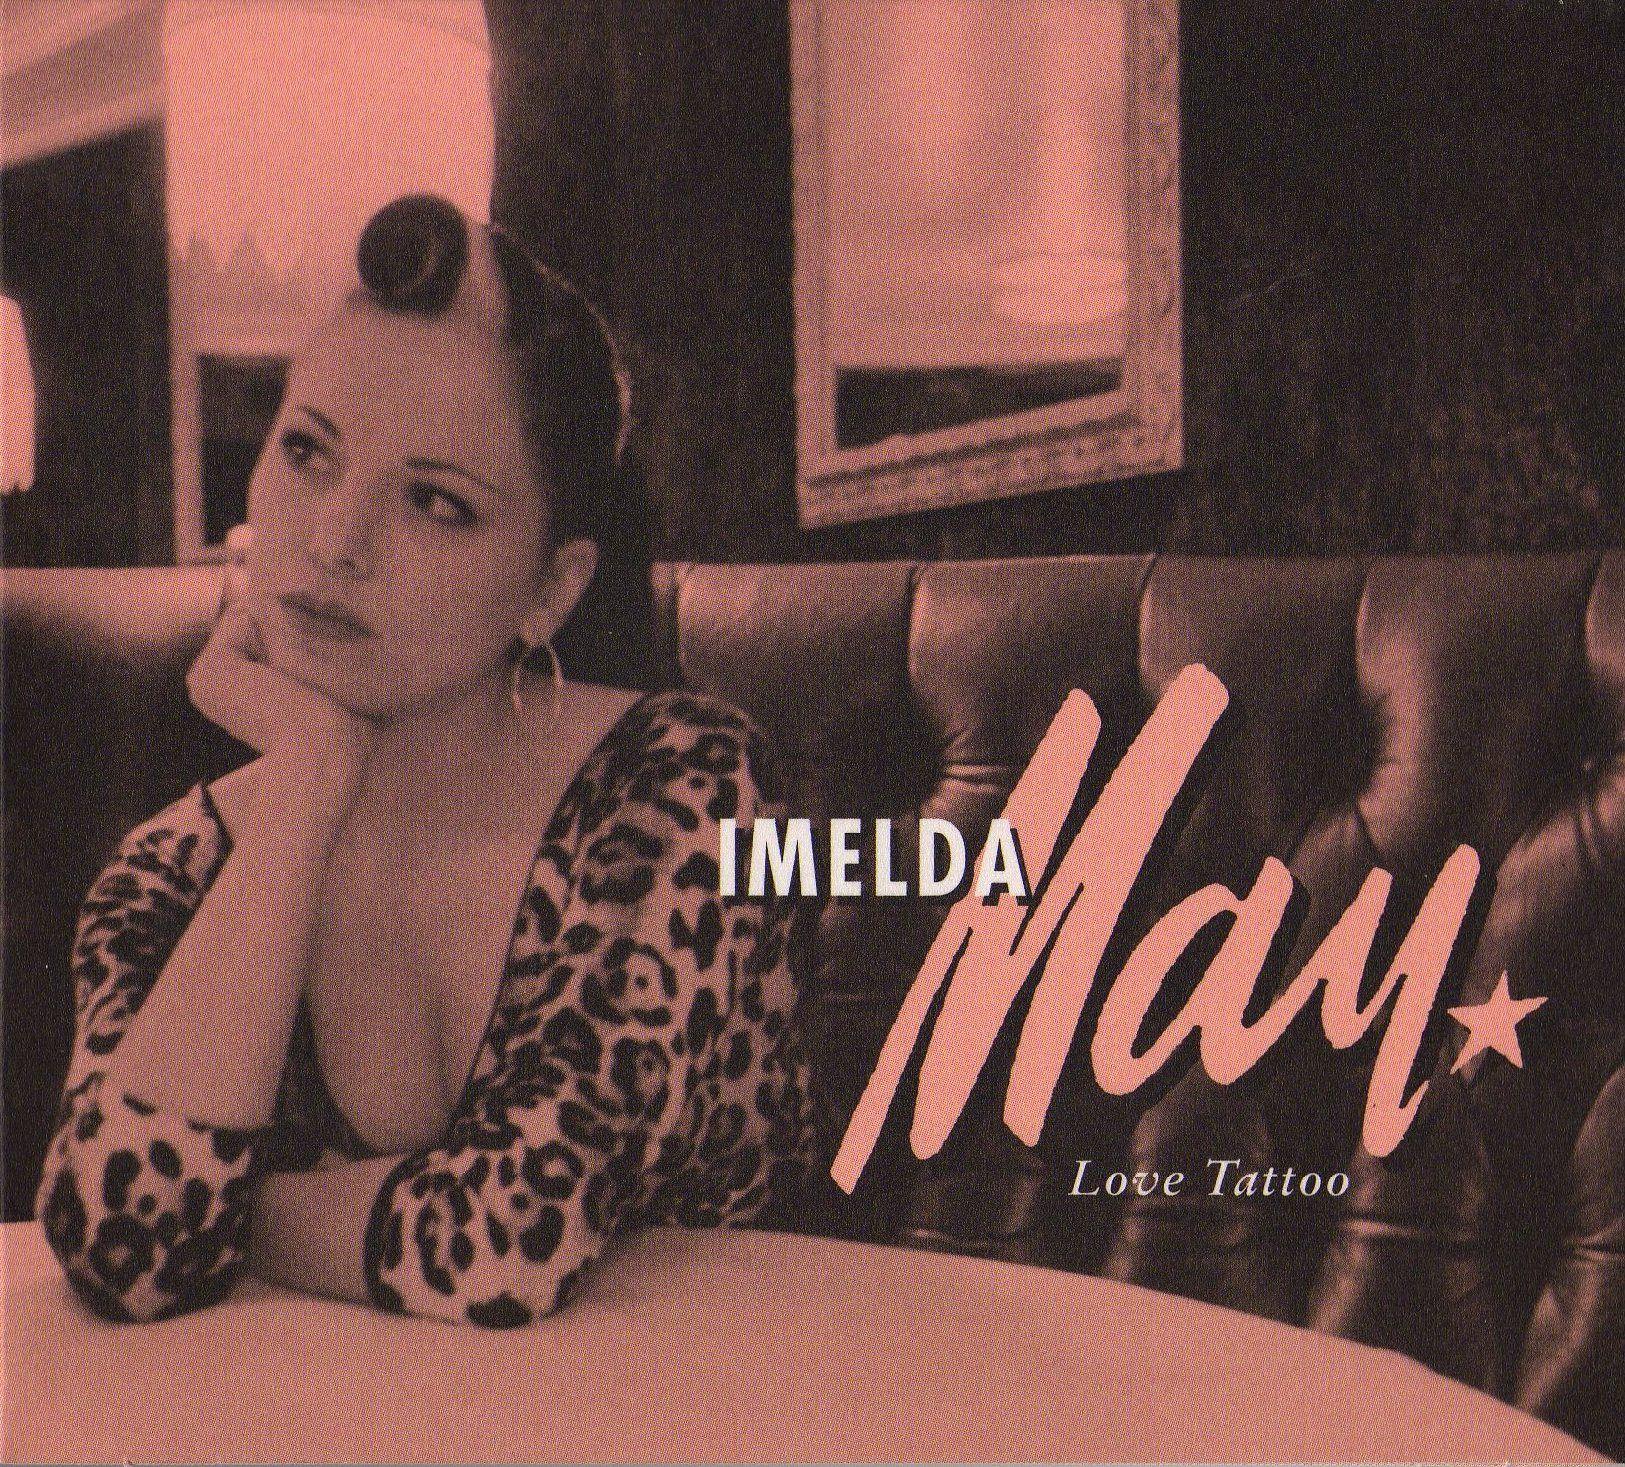 Imelda May - Love Tattoo album cover